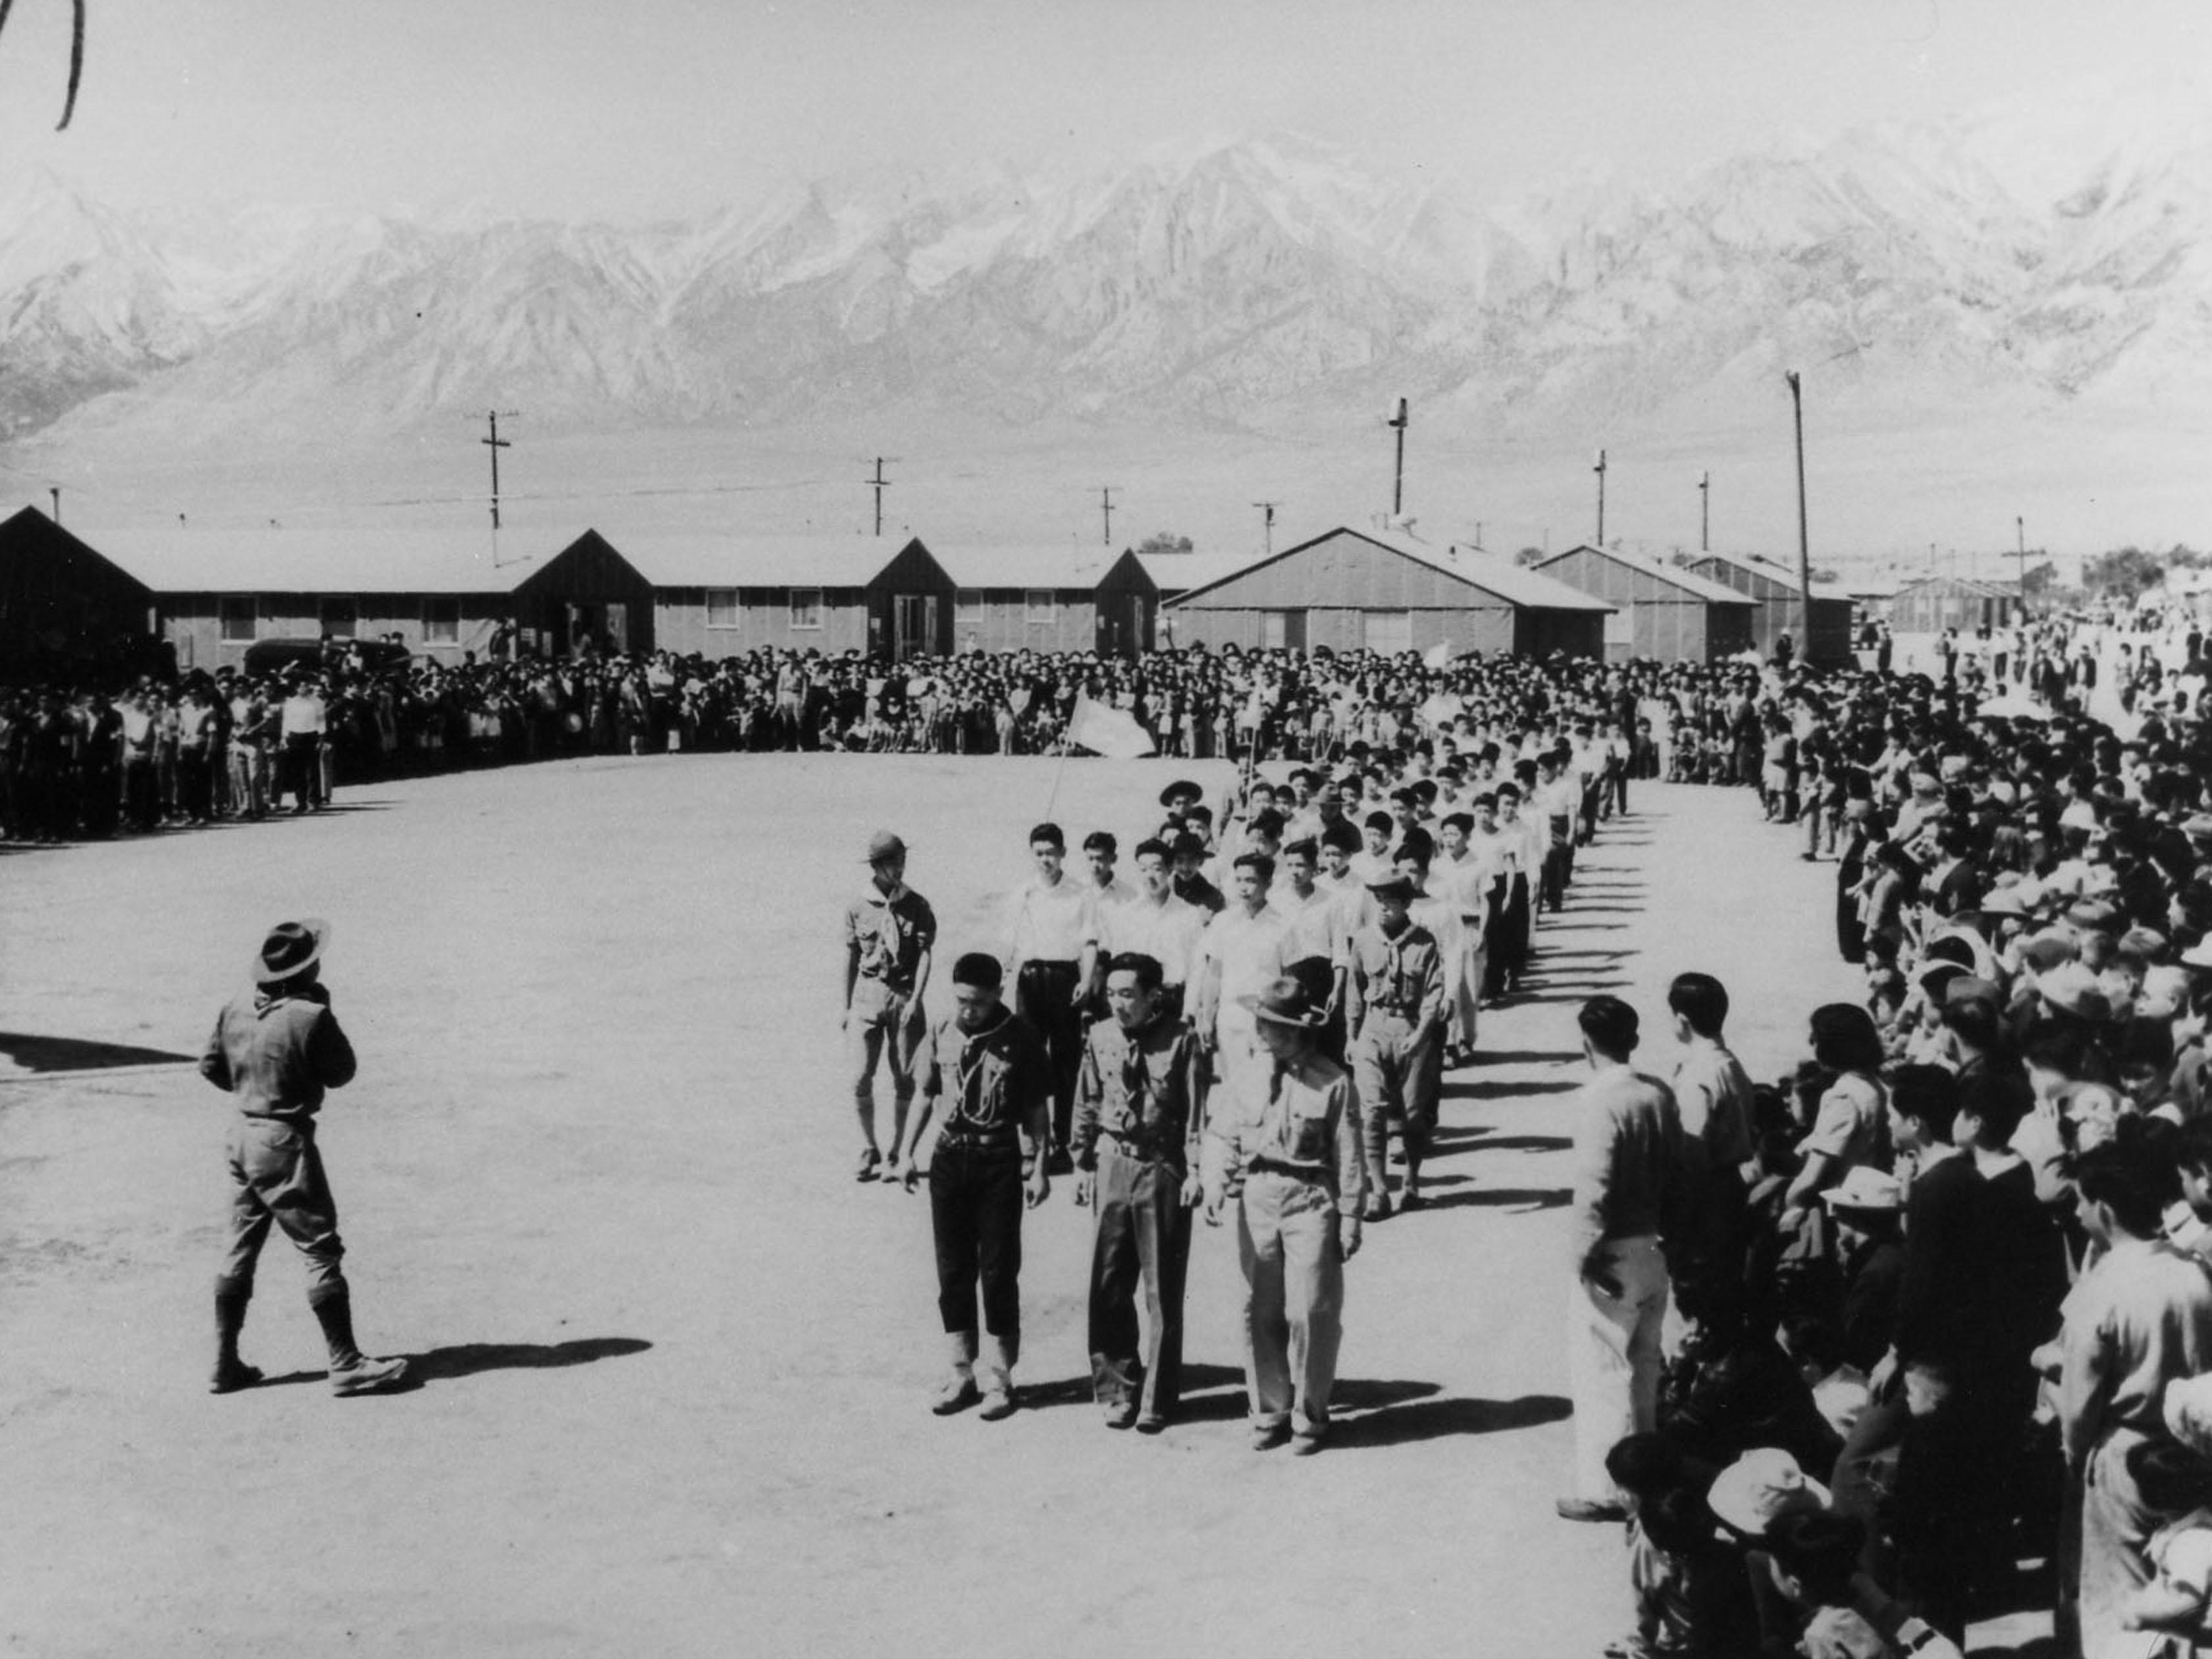 manzanar internment camp california experience during Manzanar national historic site: manzanar internment camp - see 394 traveler reviews, 378 candid photos, and great deals for independence, ca, at tripadvisor.